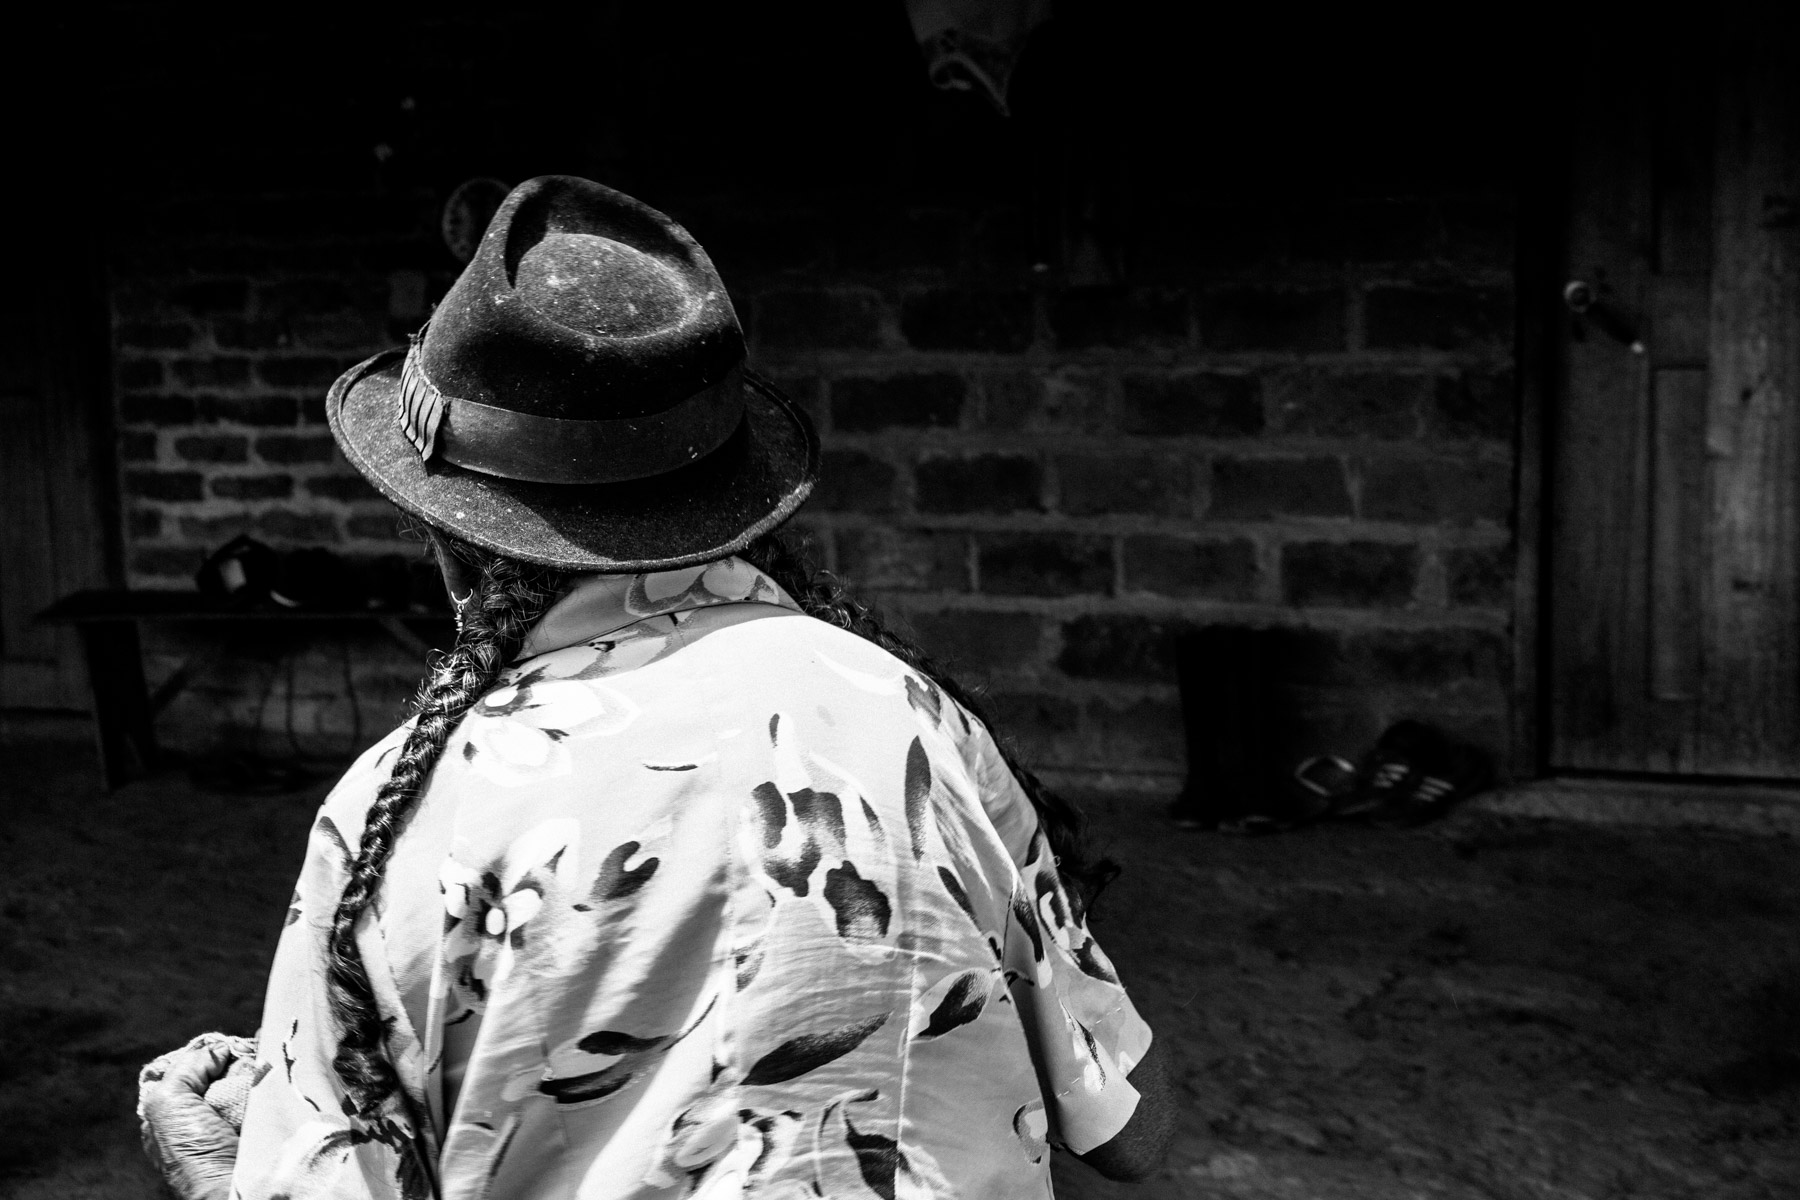 Rosalia Ul Musicue (78 años), La Primicia, Resguardo San Francisco. Cauca, Colombia, Agosto 19, 2018.